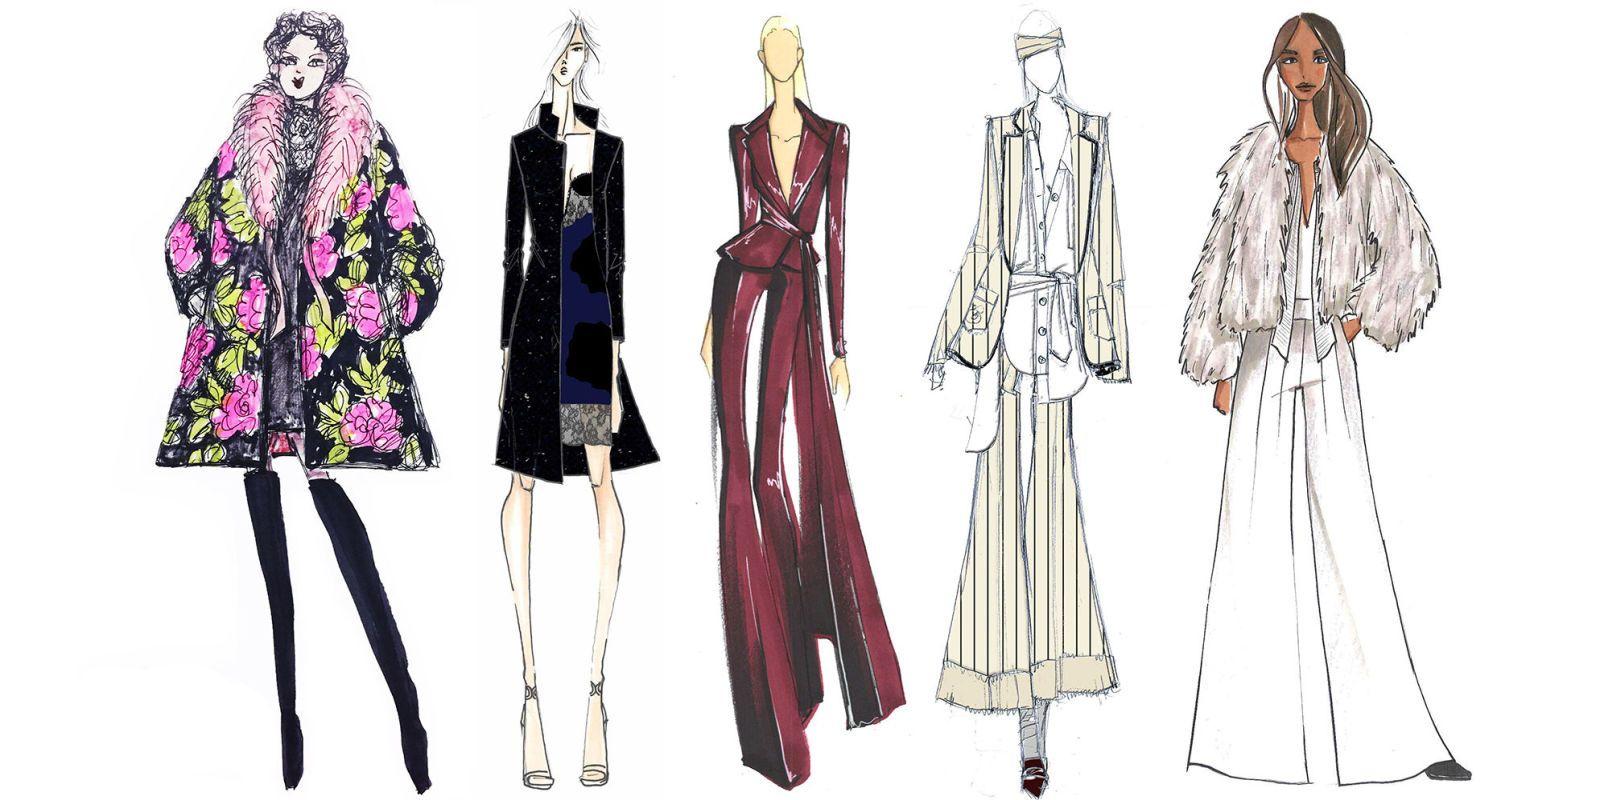 Adobe Illustrator Flat Fashion Sketch Templates - My 62